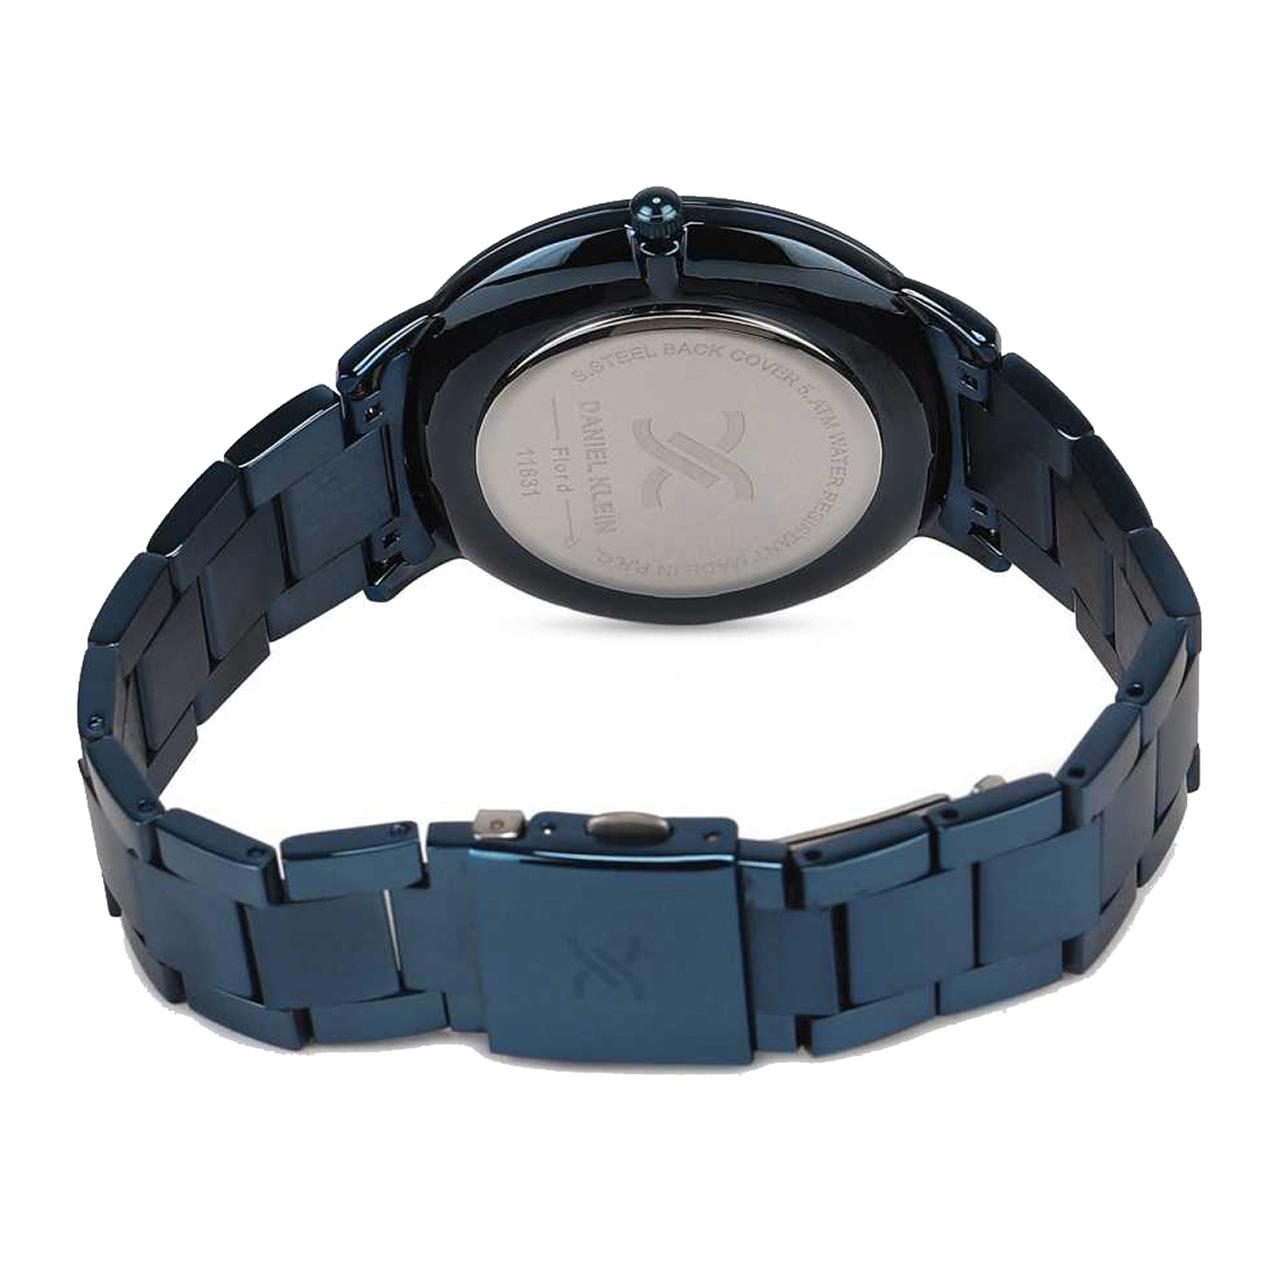 ساعت مچی عقربهای مردانه دنیل کلین مدل Fiord DK11831-5